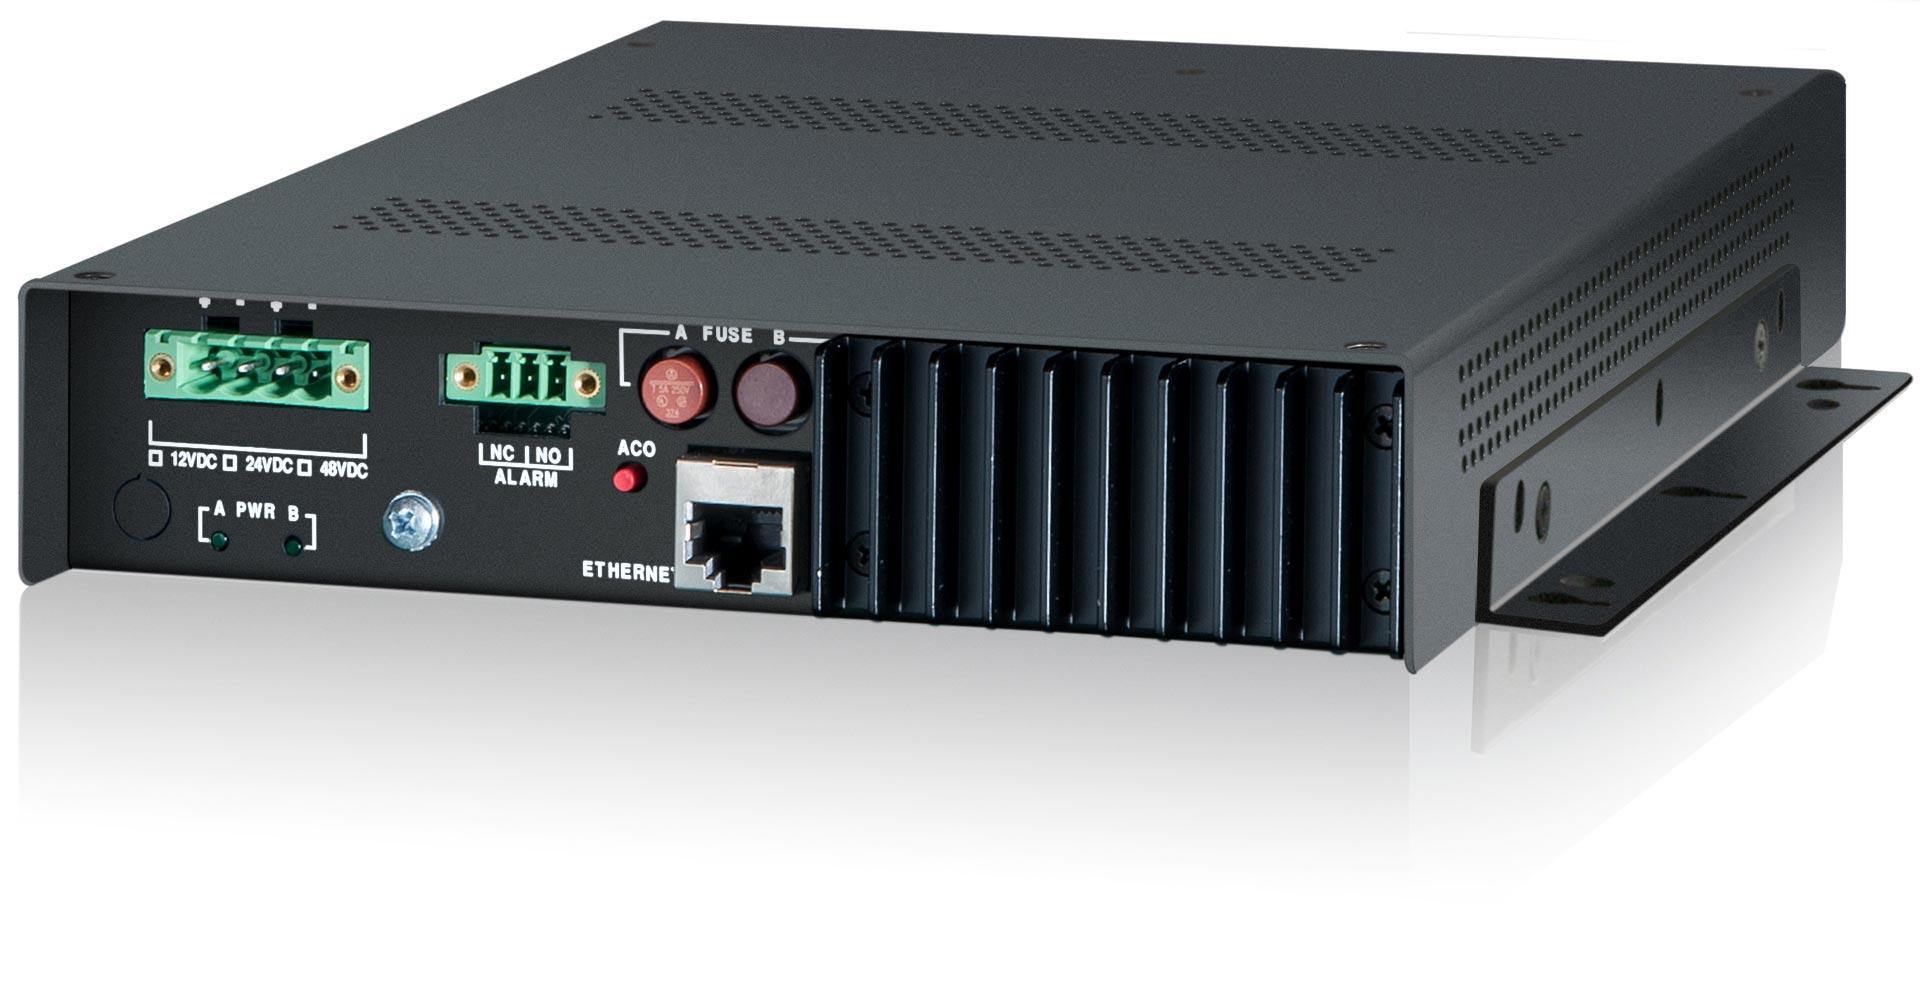 C37 94 over IP - TC Communications